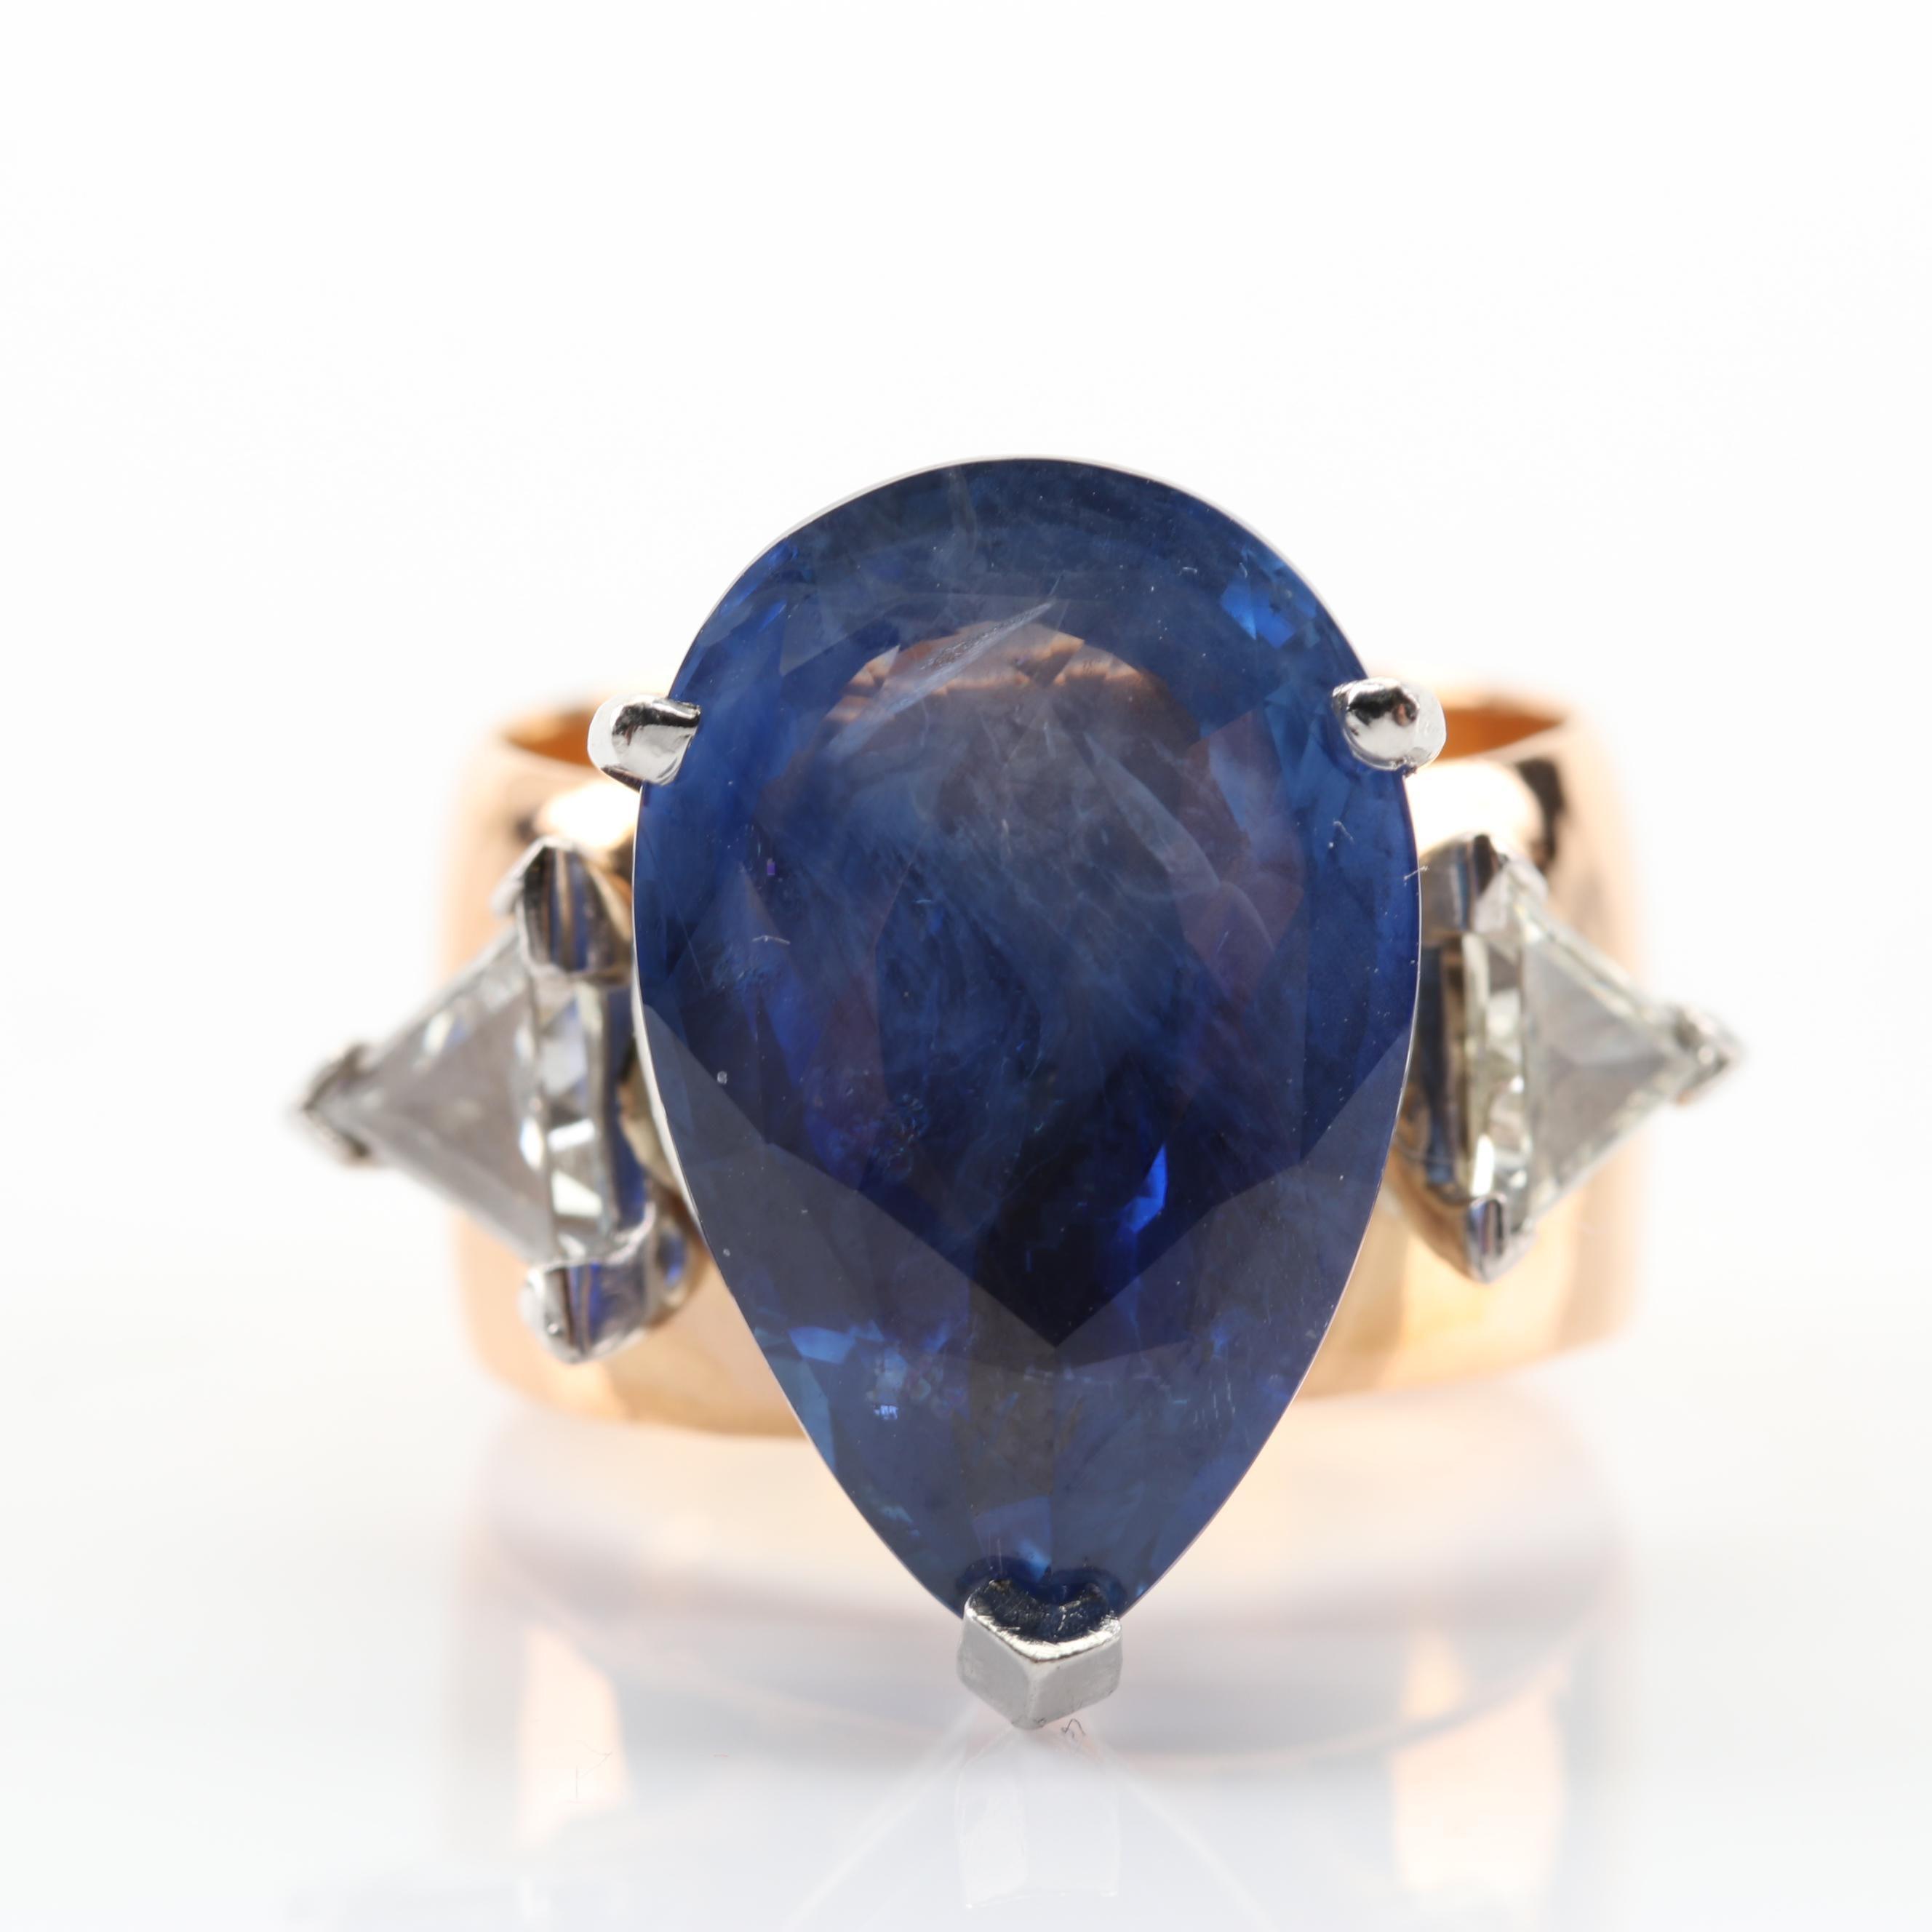 Samuel Hope 18K Yellow Gold 10.13 CT Sapphire and 1.10 CTW Diamond Ring